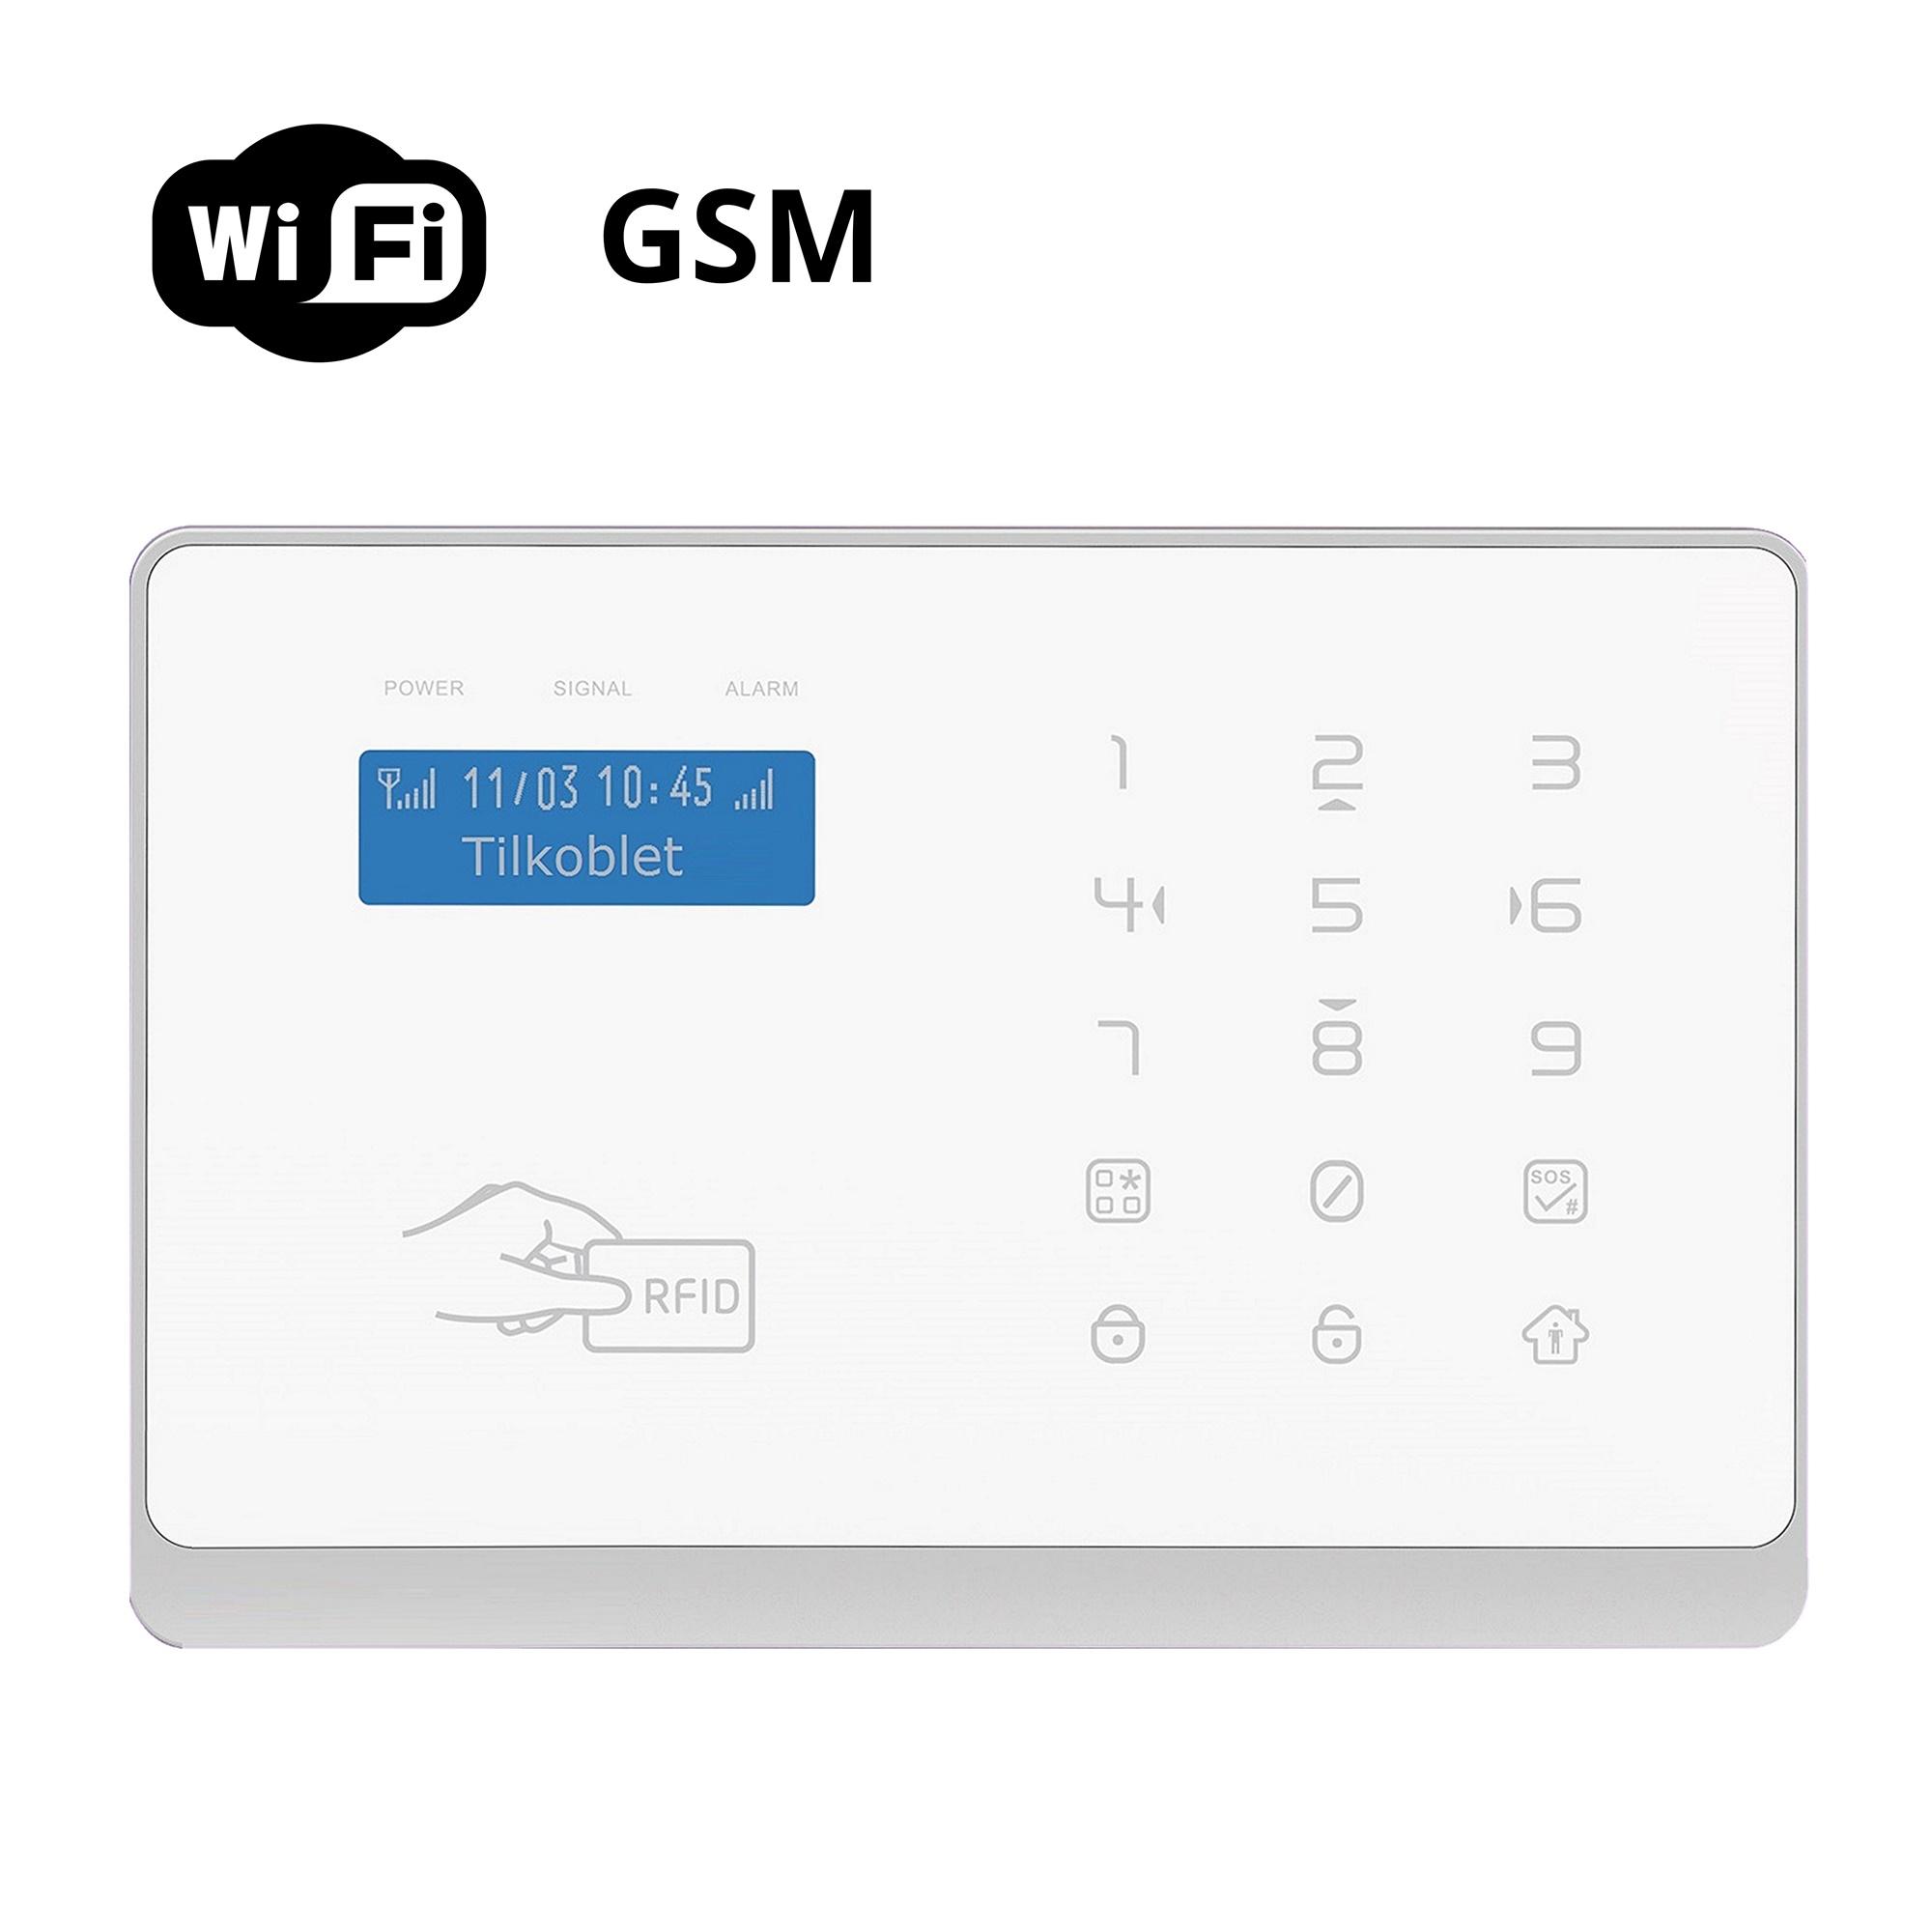 WiFi Deluxe alarmer